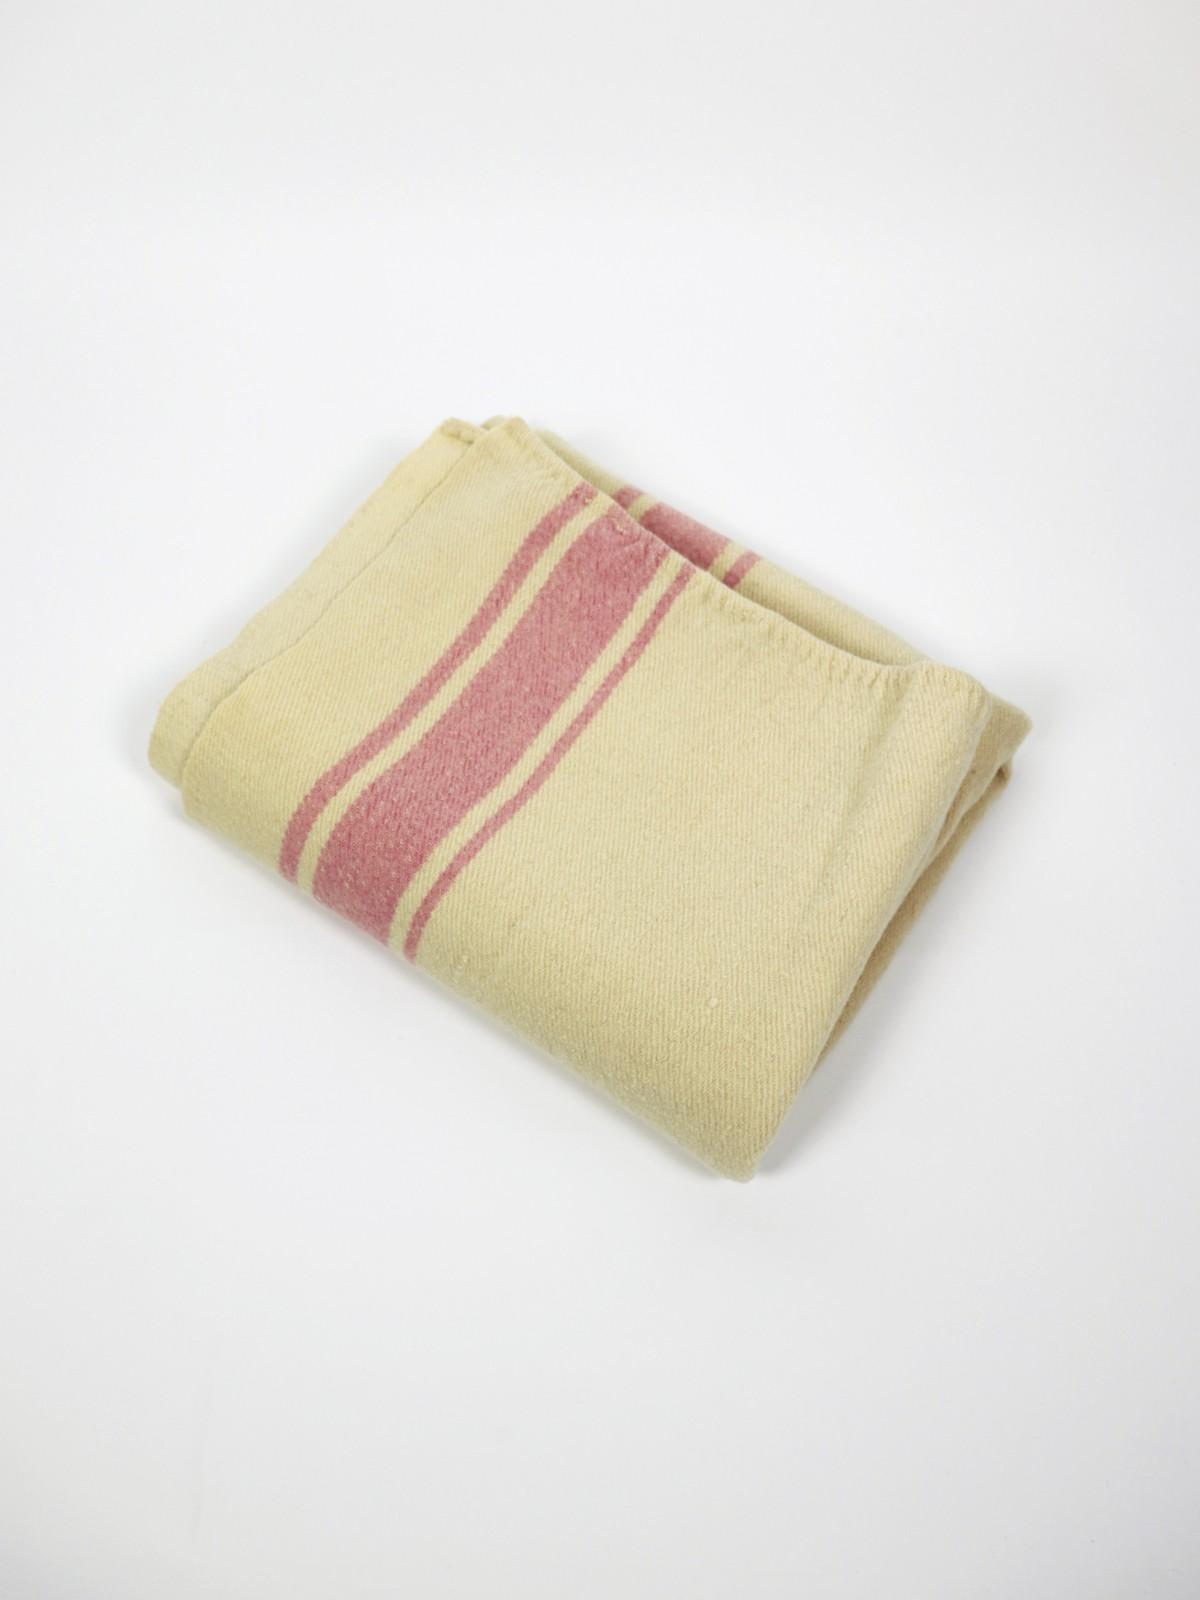 canada,wool,blanket